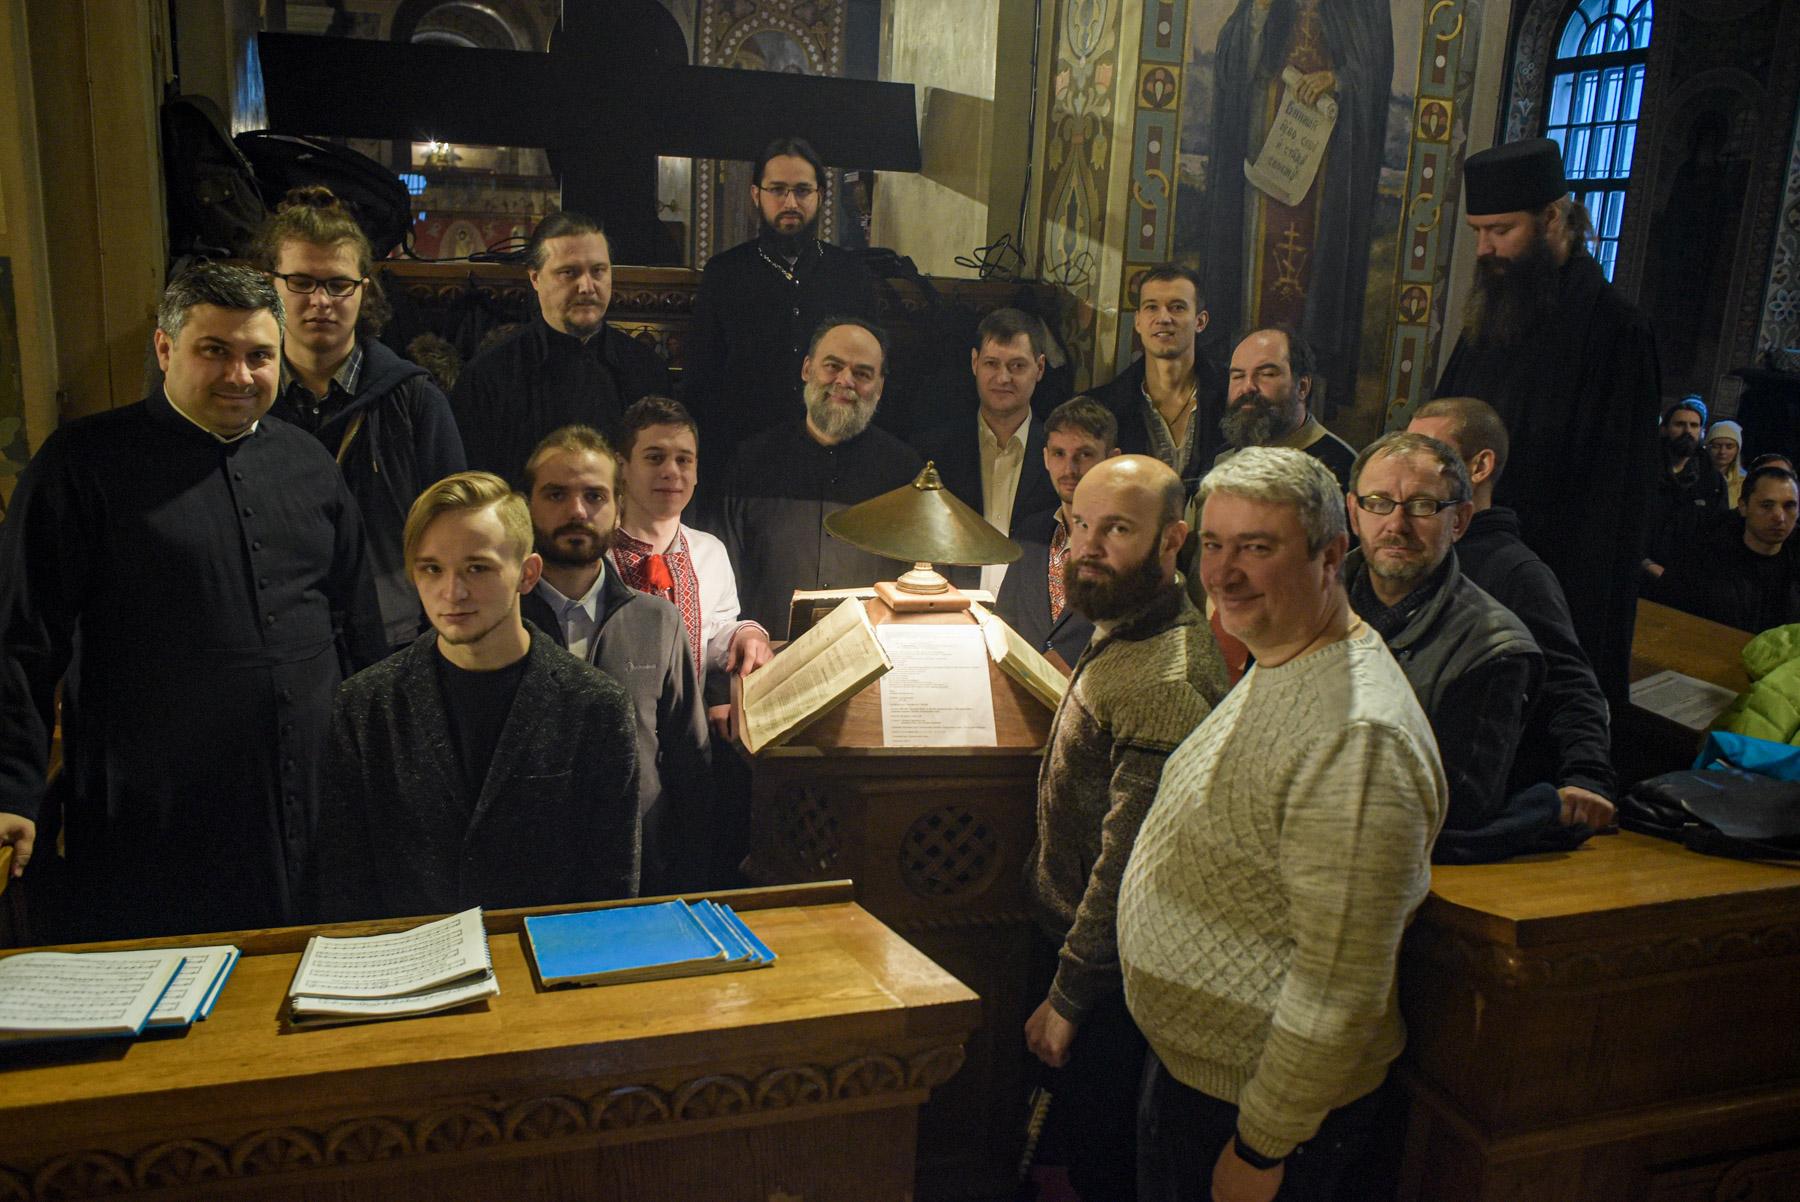 photos of orthodox christmas 0212 2